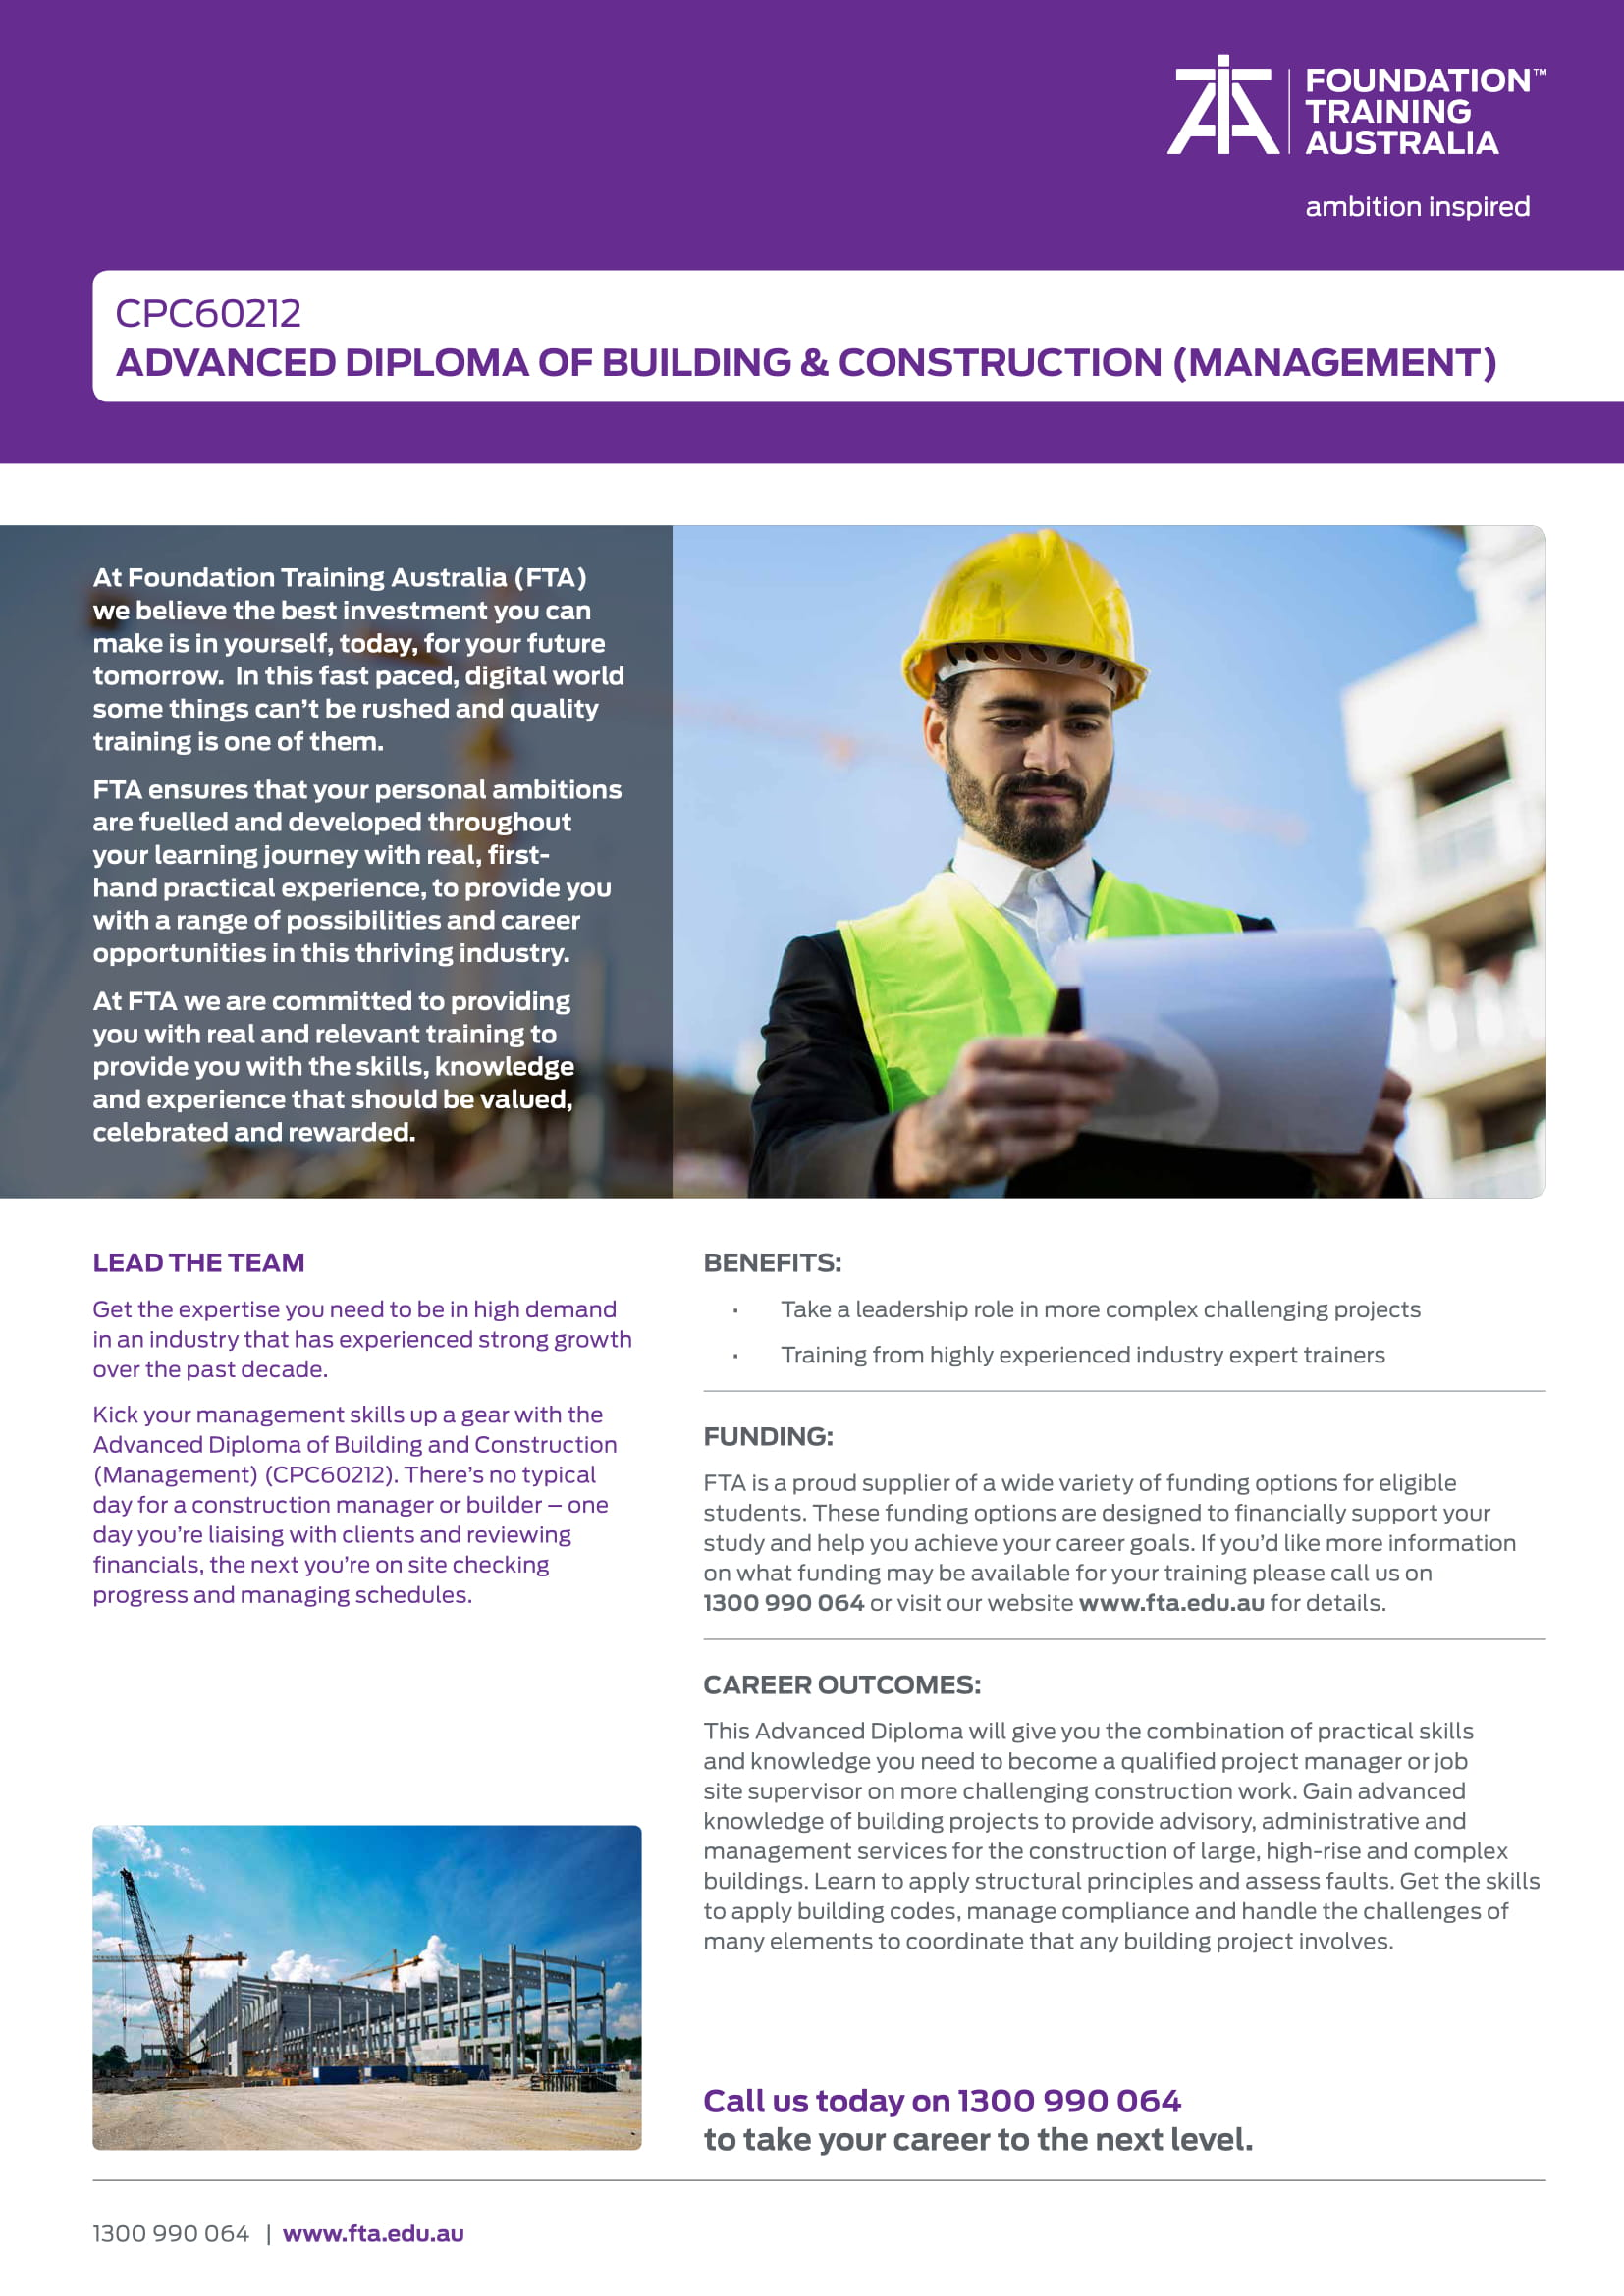 https://www.fta.edu.au/wp-content/uploads/2020/06/TP1.MK_.018-Advanced-Diploma-of-Building-Construction-Management-CPC60212-V1-DIGITAL-1.jpg